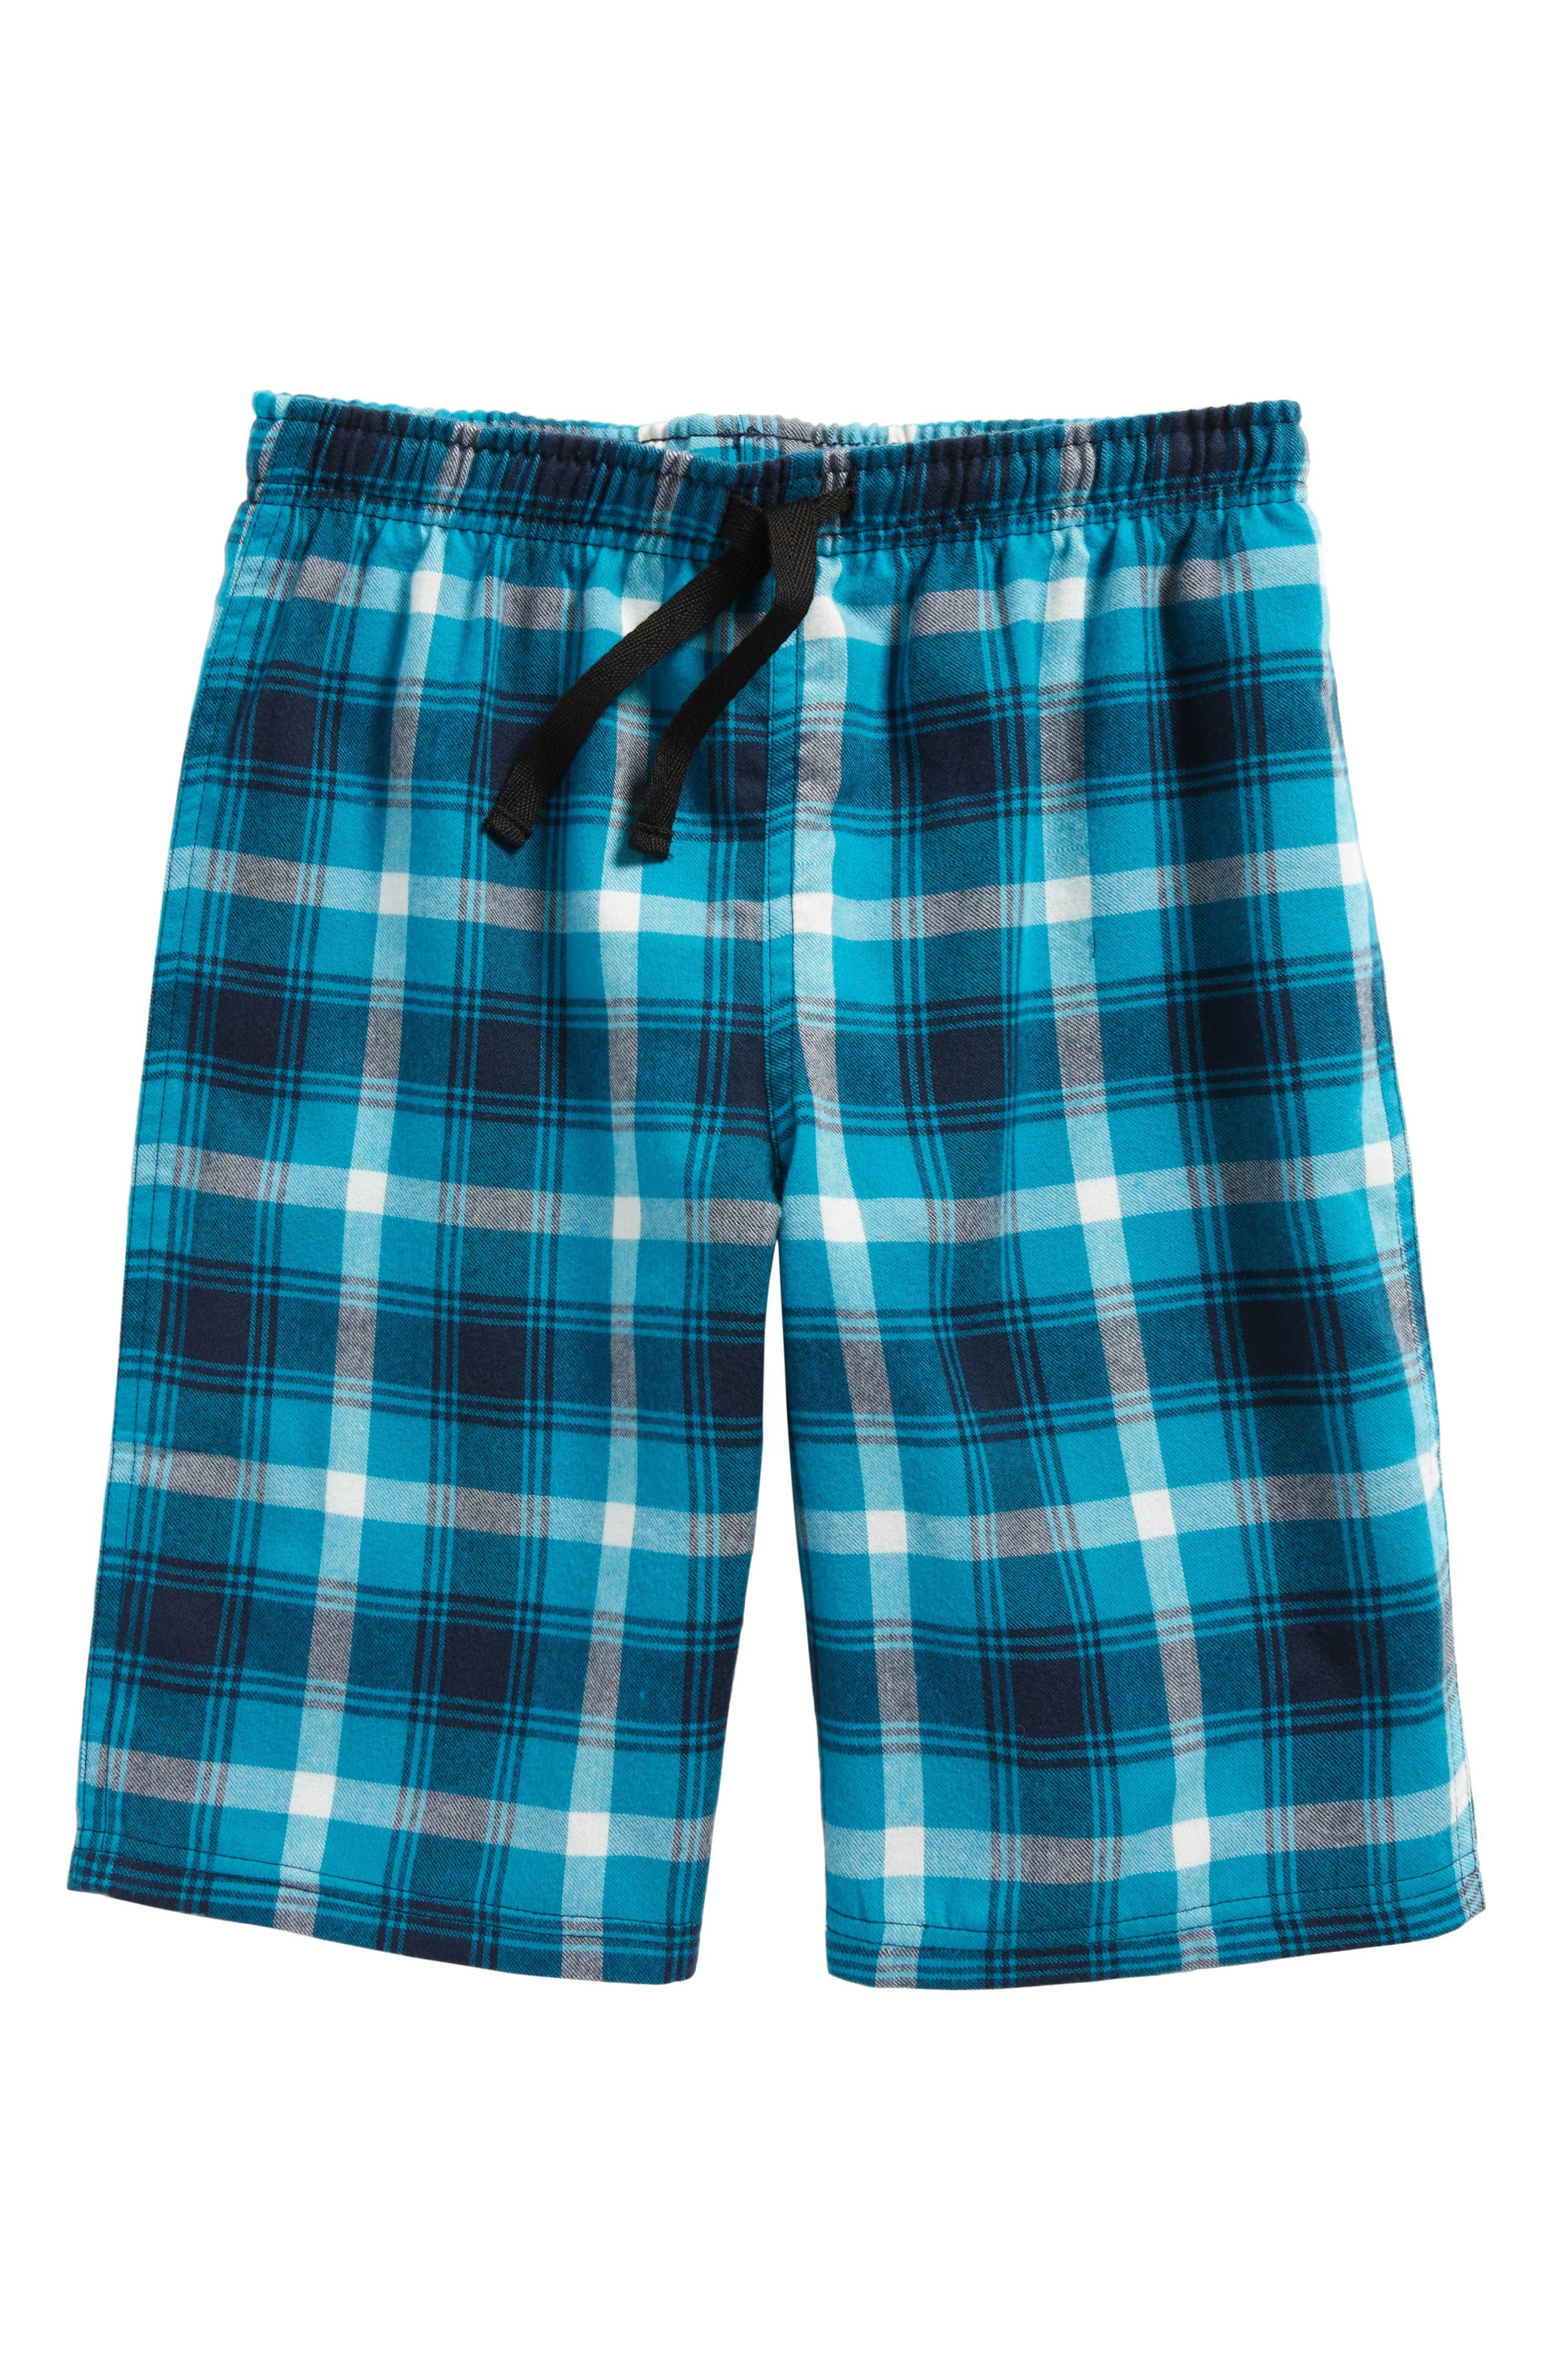 Alternate Image 1 Selected - Tucker + Tate Flannel Shorts (Big Boys)